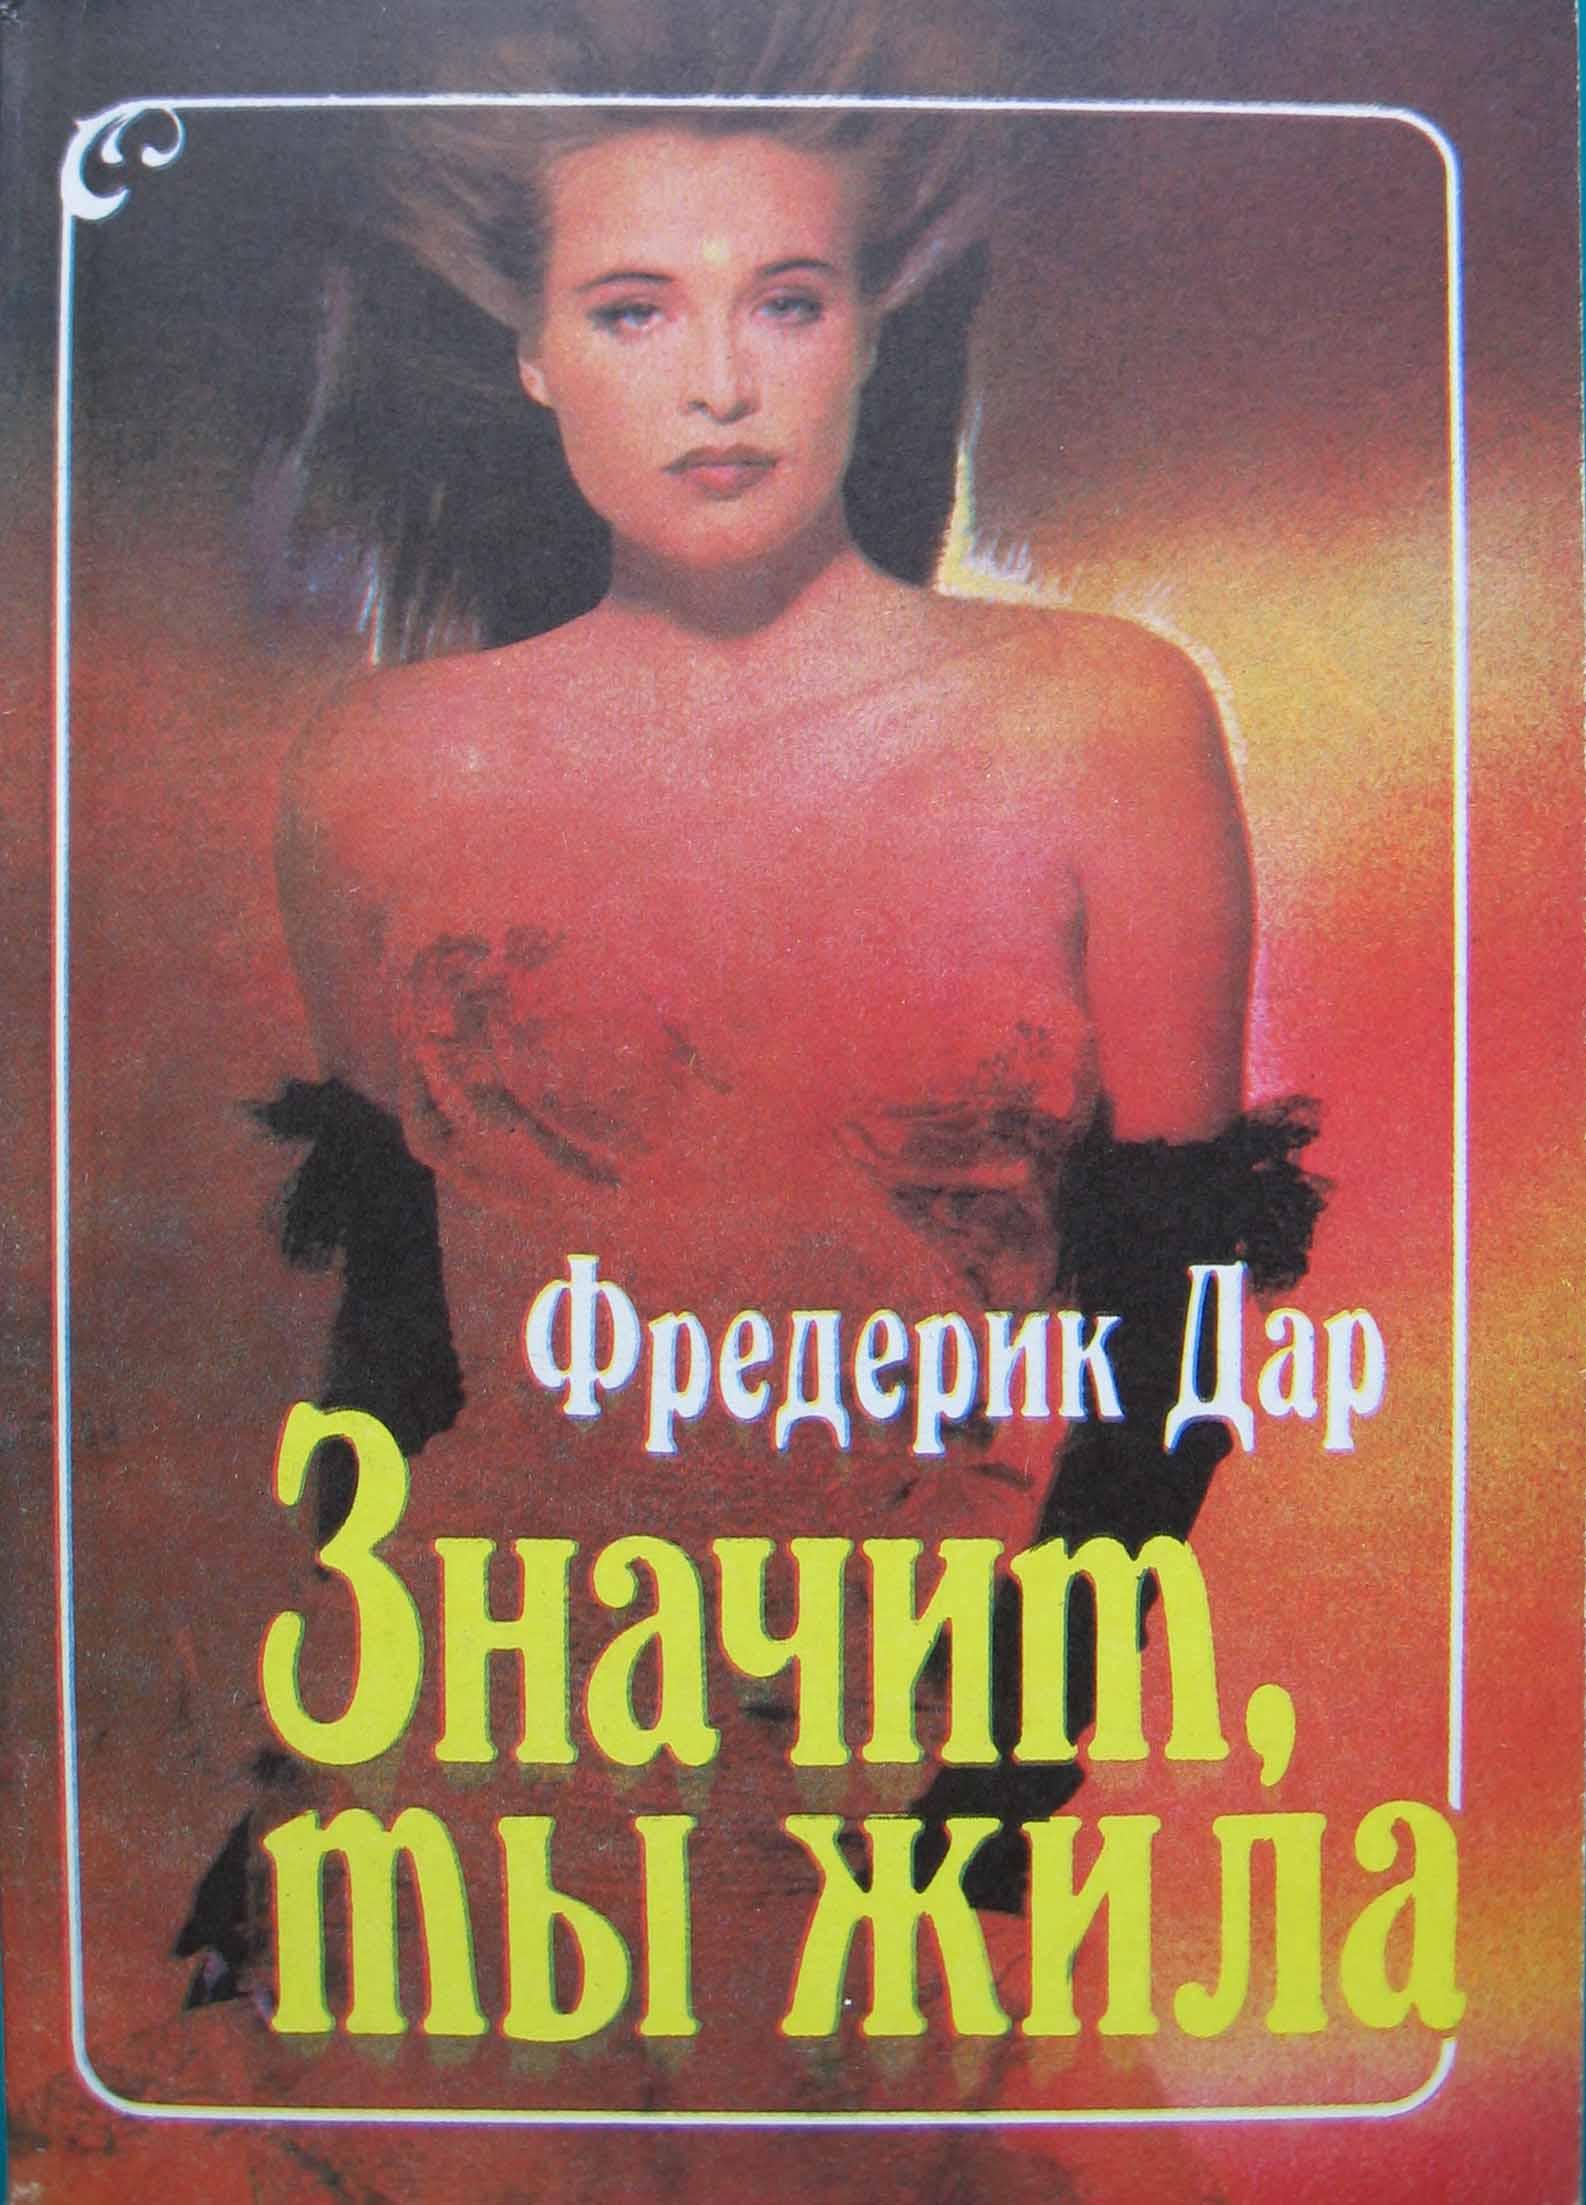 1993. Значит, ты жила! (Toi, qui vivais, 1958). Пер. Н. Нолле, «Ритм», М.